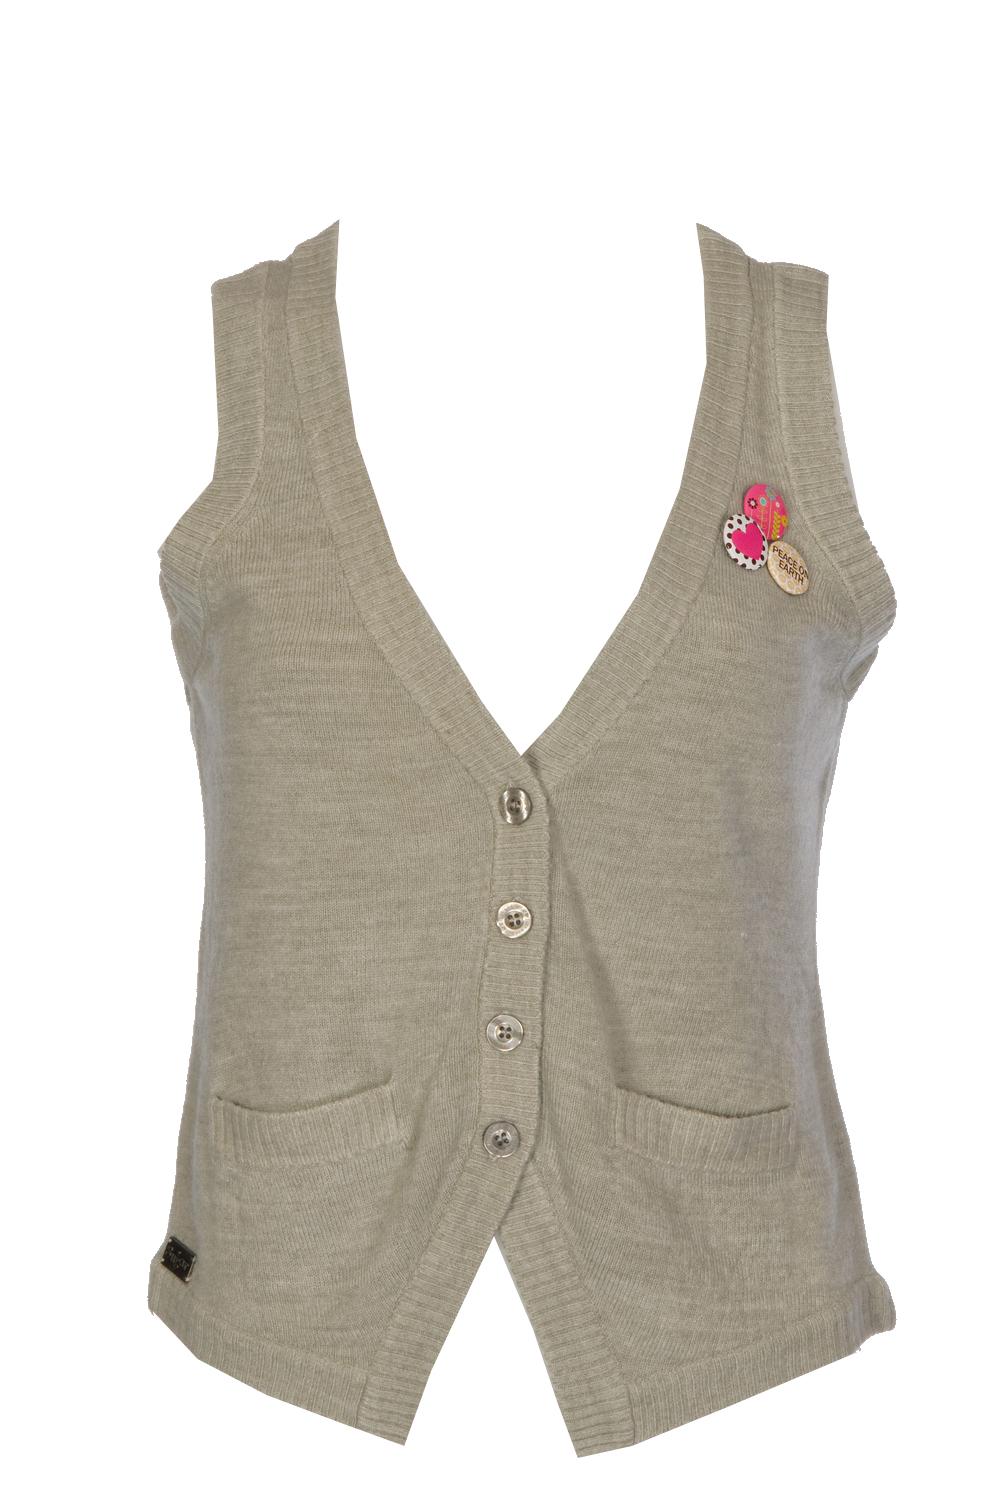 Raindrop Knit Vest by Just Add Sugar